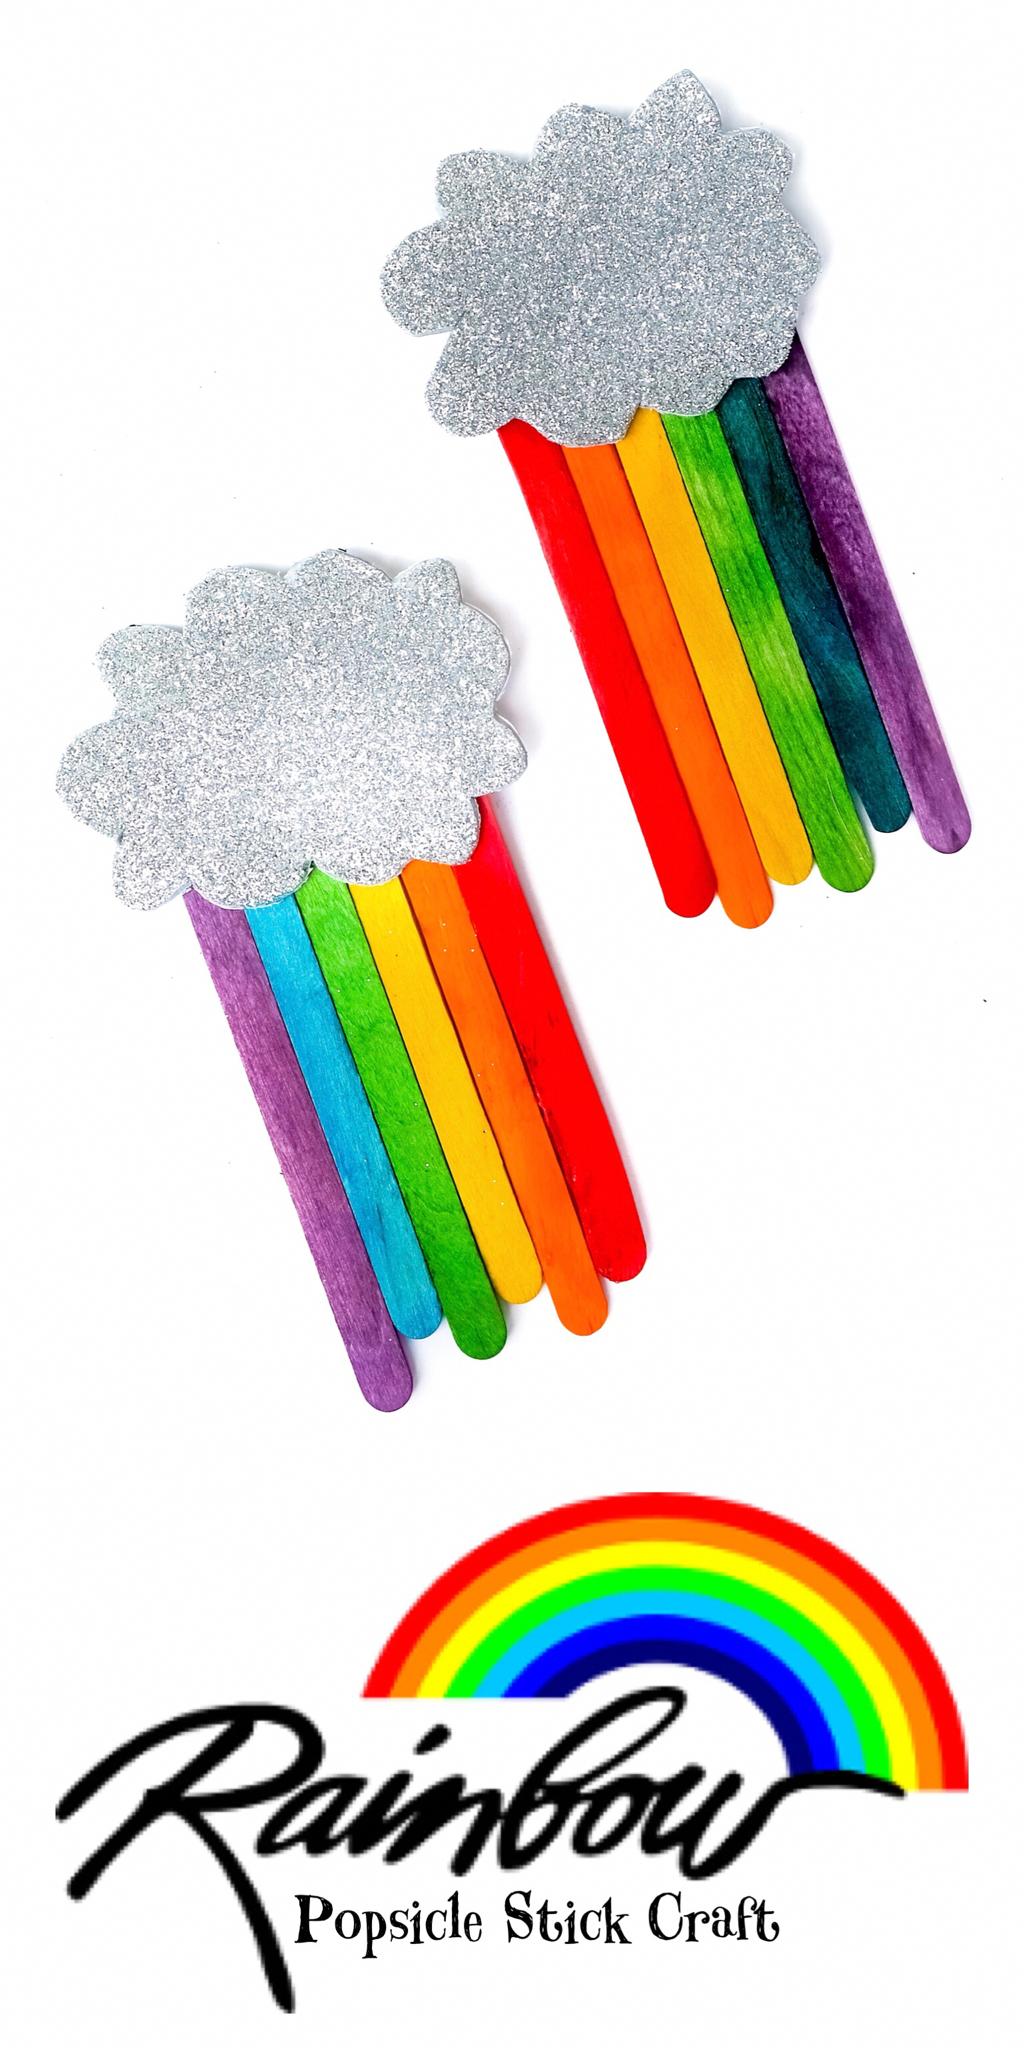 Rainbow Popsicle Stick Craft